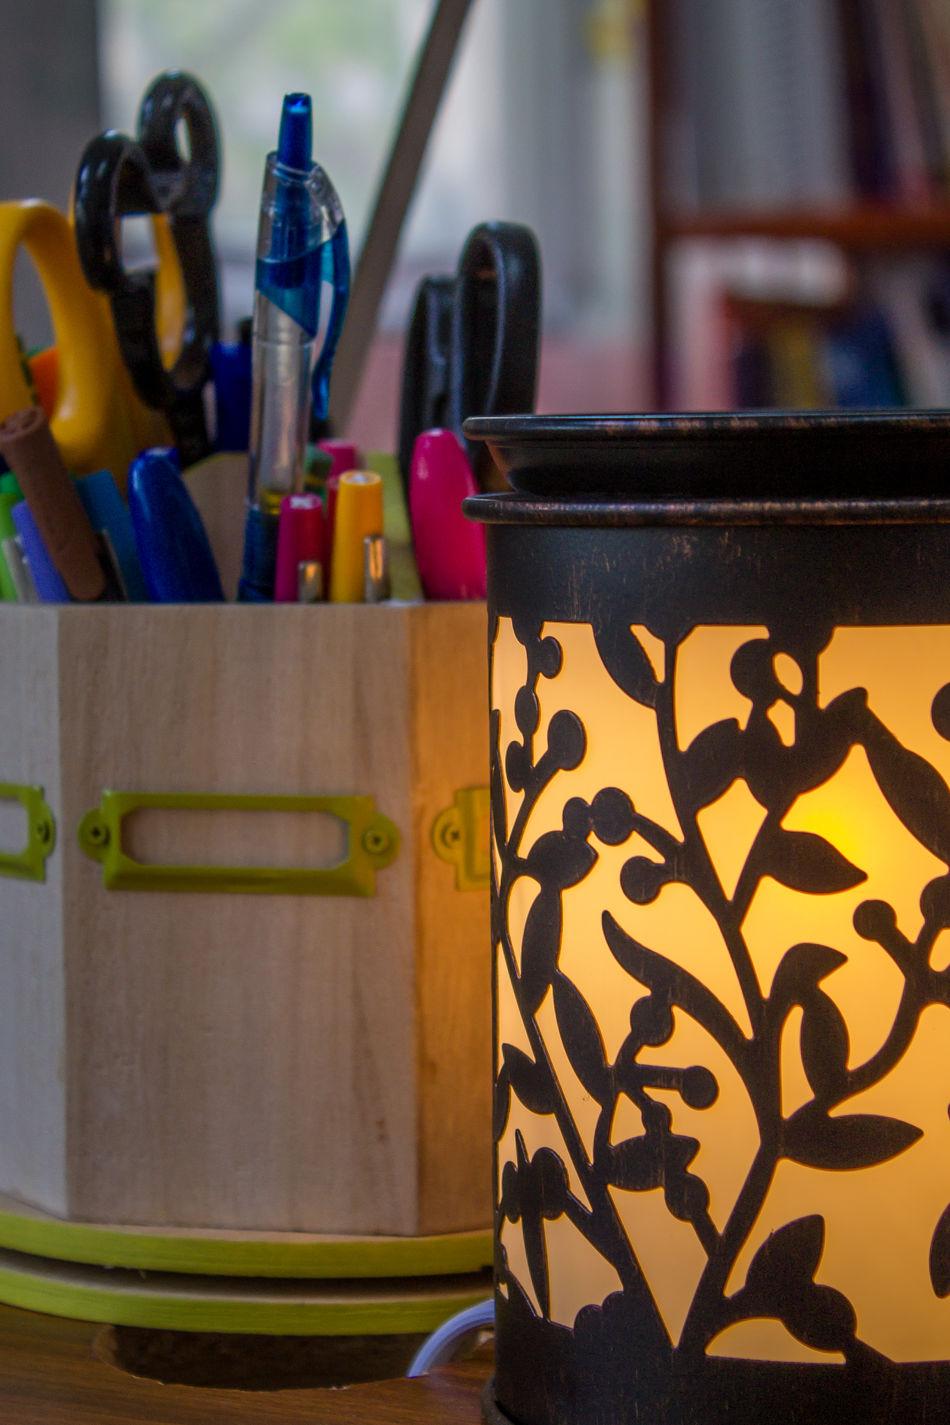 Candlelight Close-up Day Desk Organizer Glow Indoors  No People Office Office Desk Pens Principal School Desk Sentsy Zhuhai